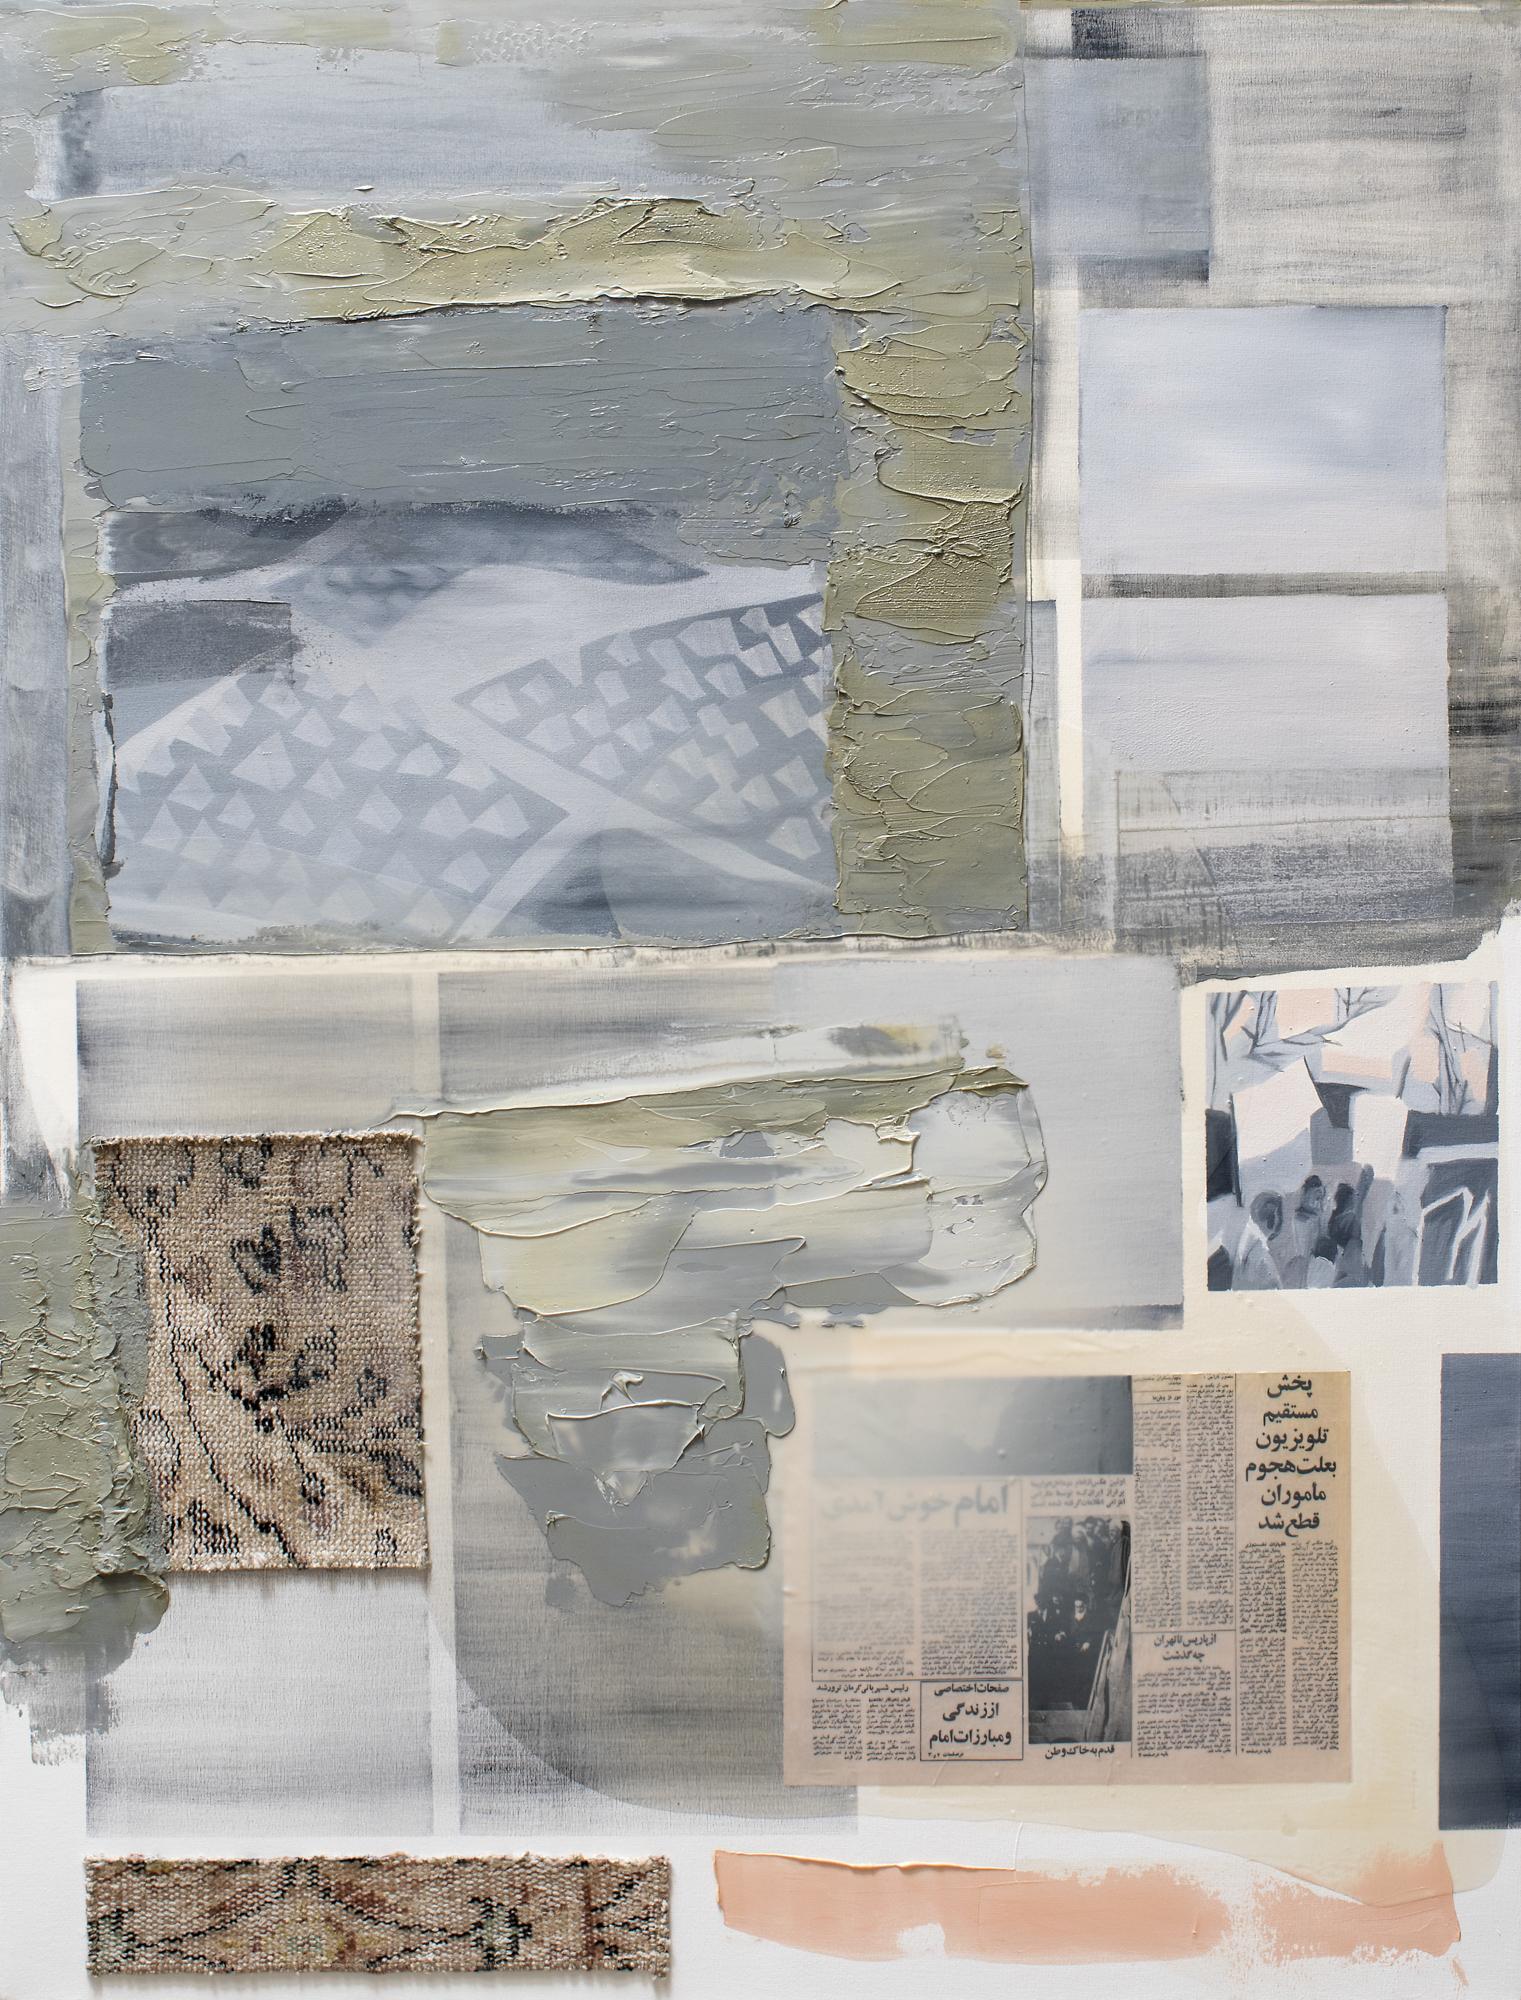 Sepideh Mehraban, Untitled (2017), SMITH.